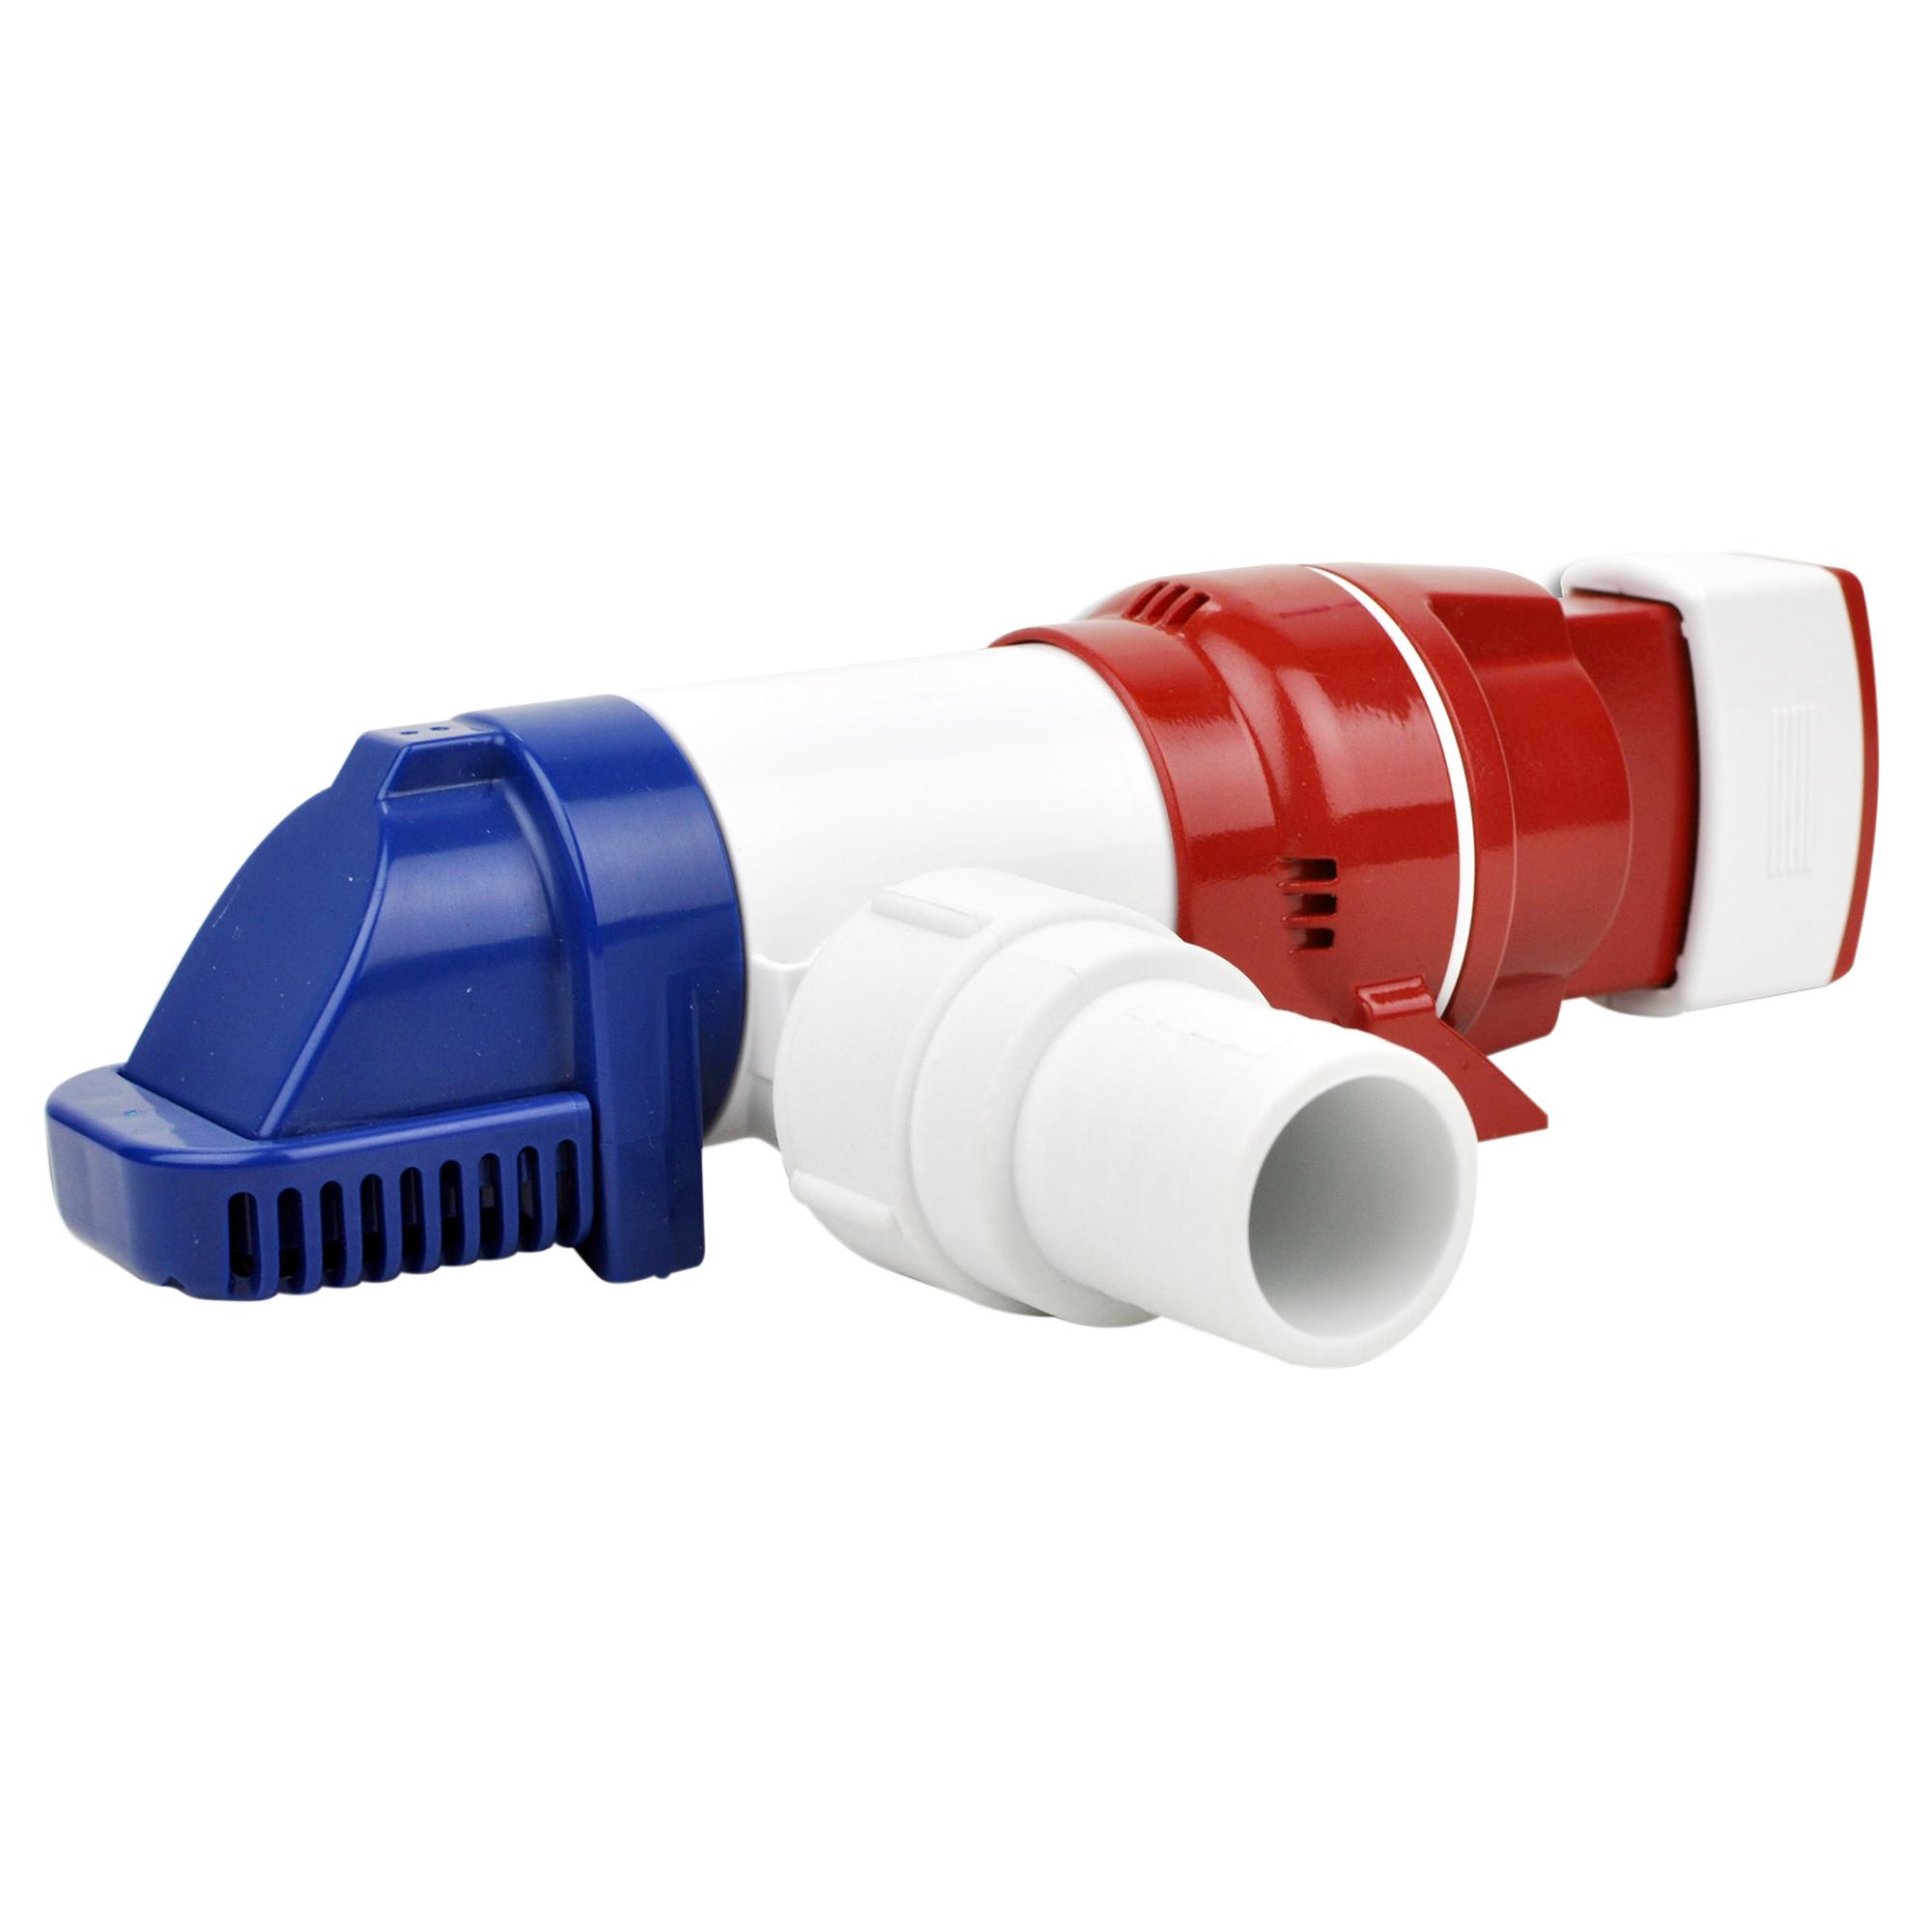 Rule LoPro 900 GPH Automatic Bilge Pump photo